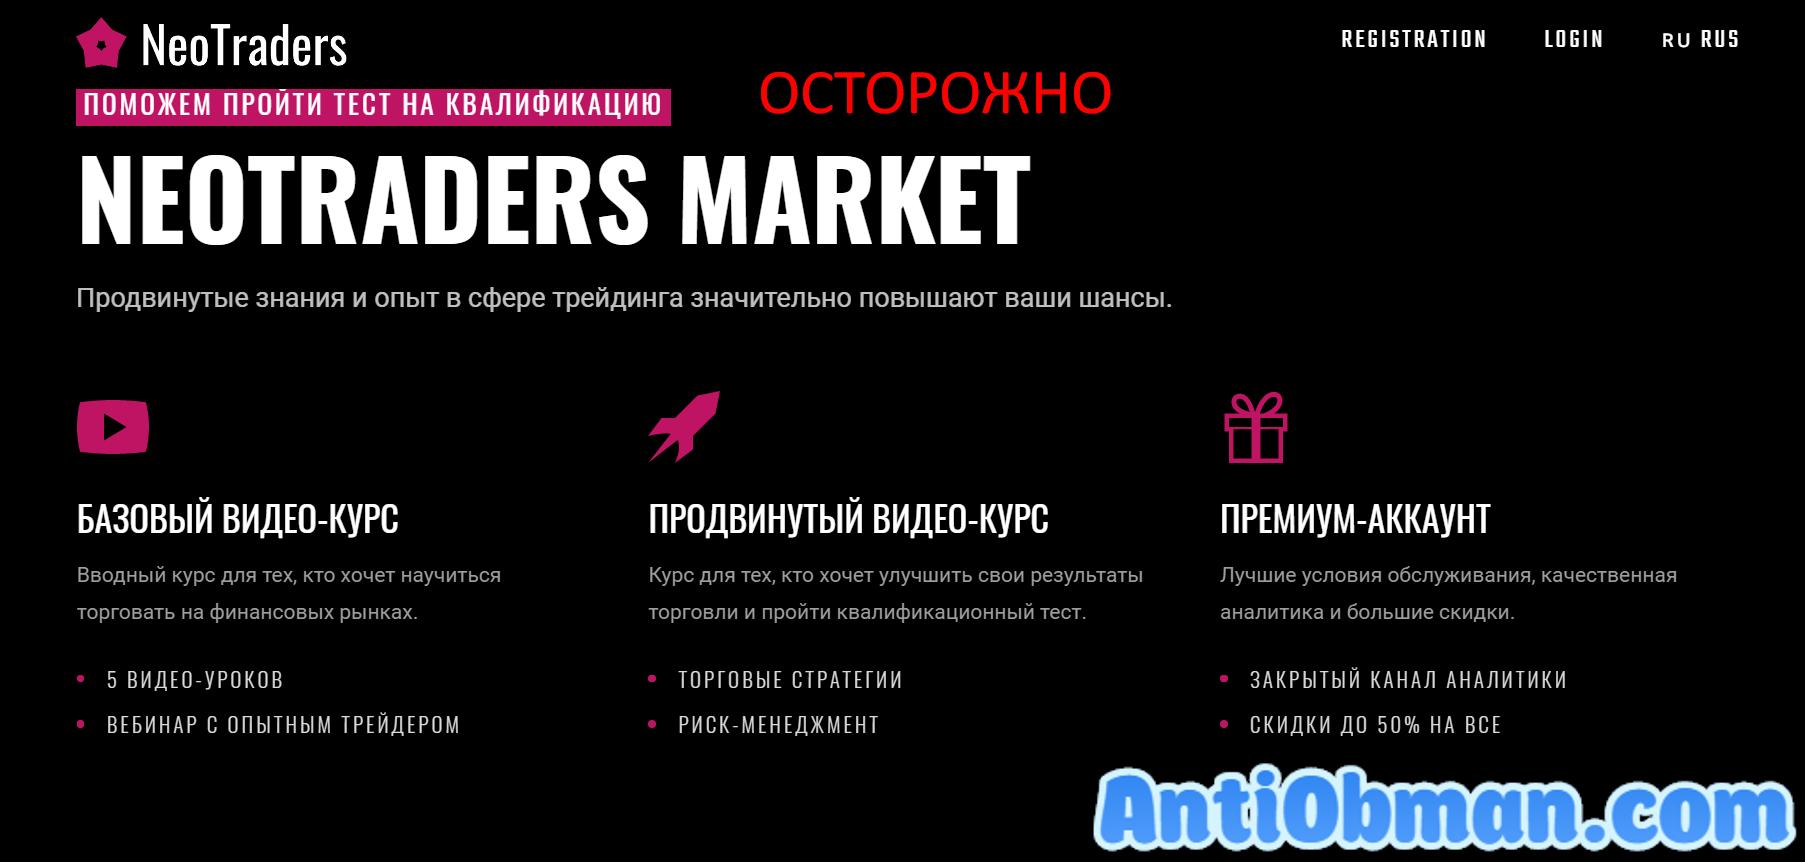 NeoTraders - какие отзывы? Обзор neotraders.io